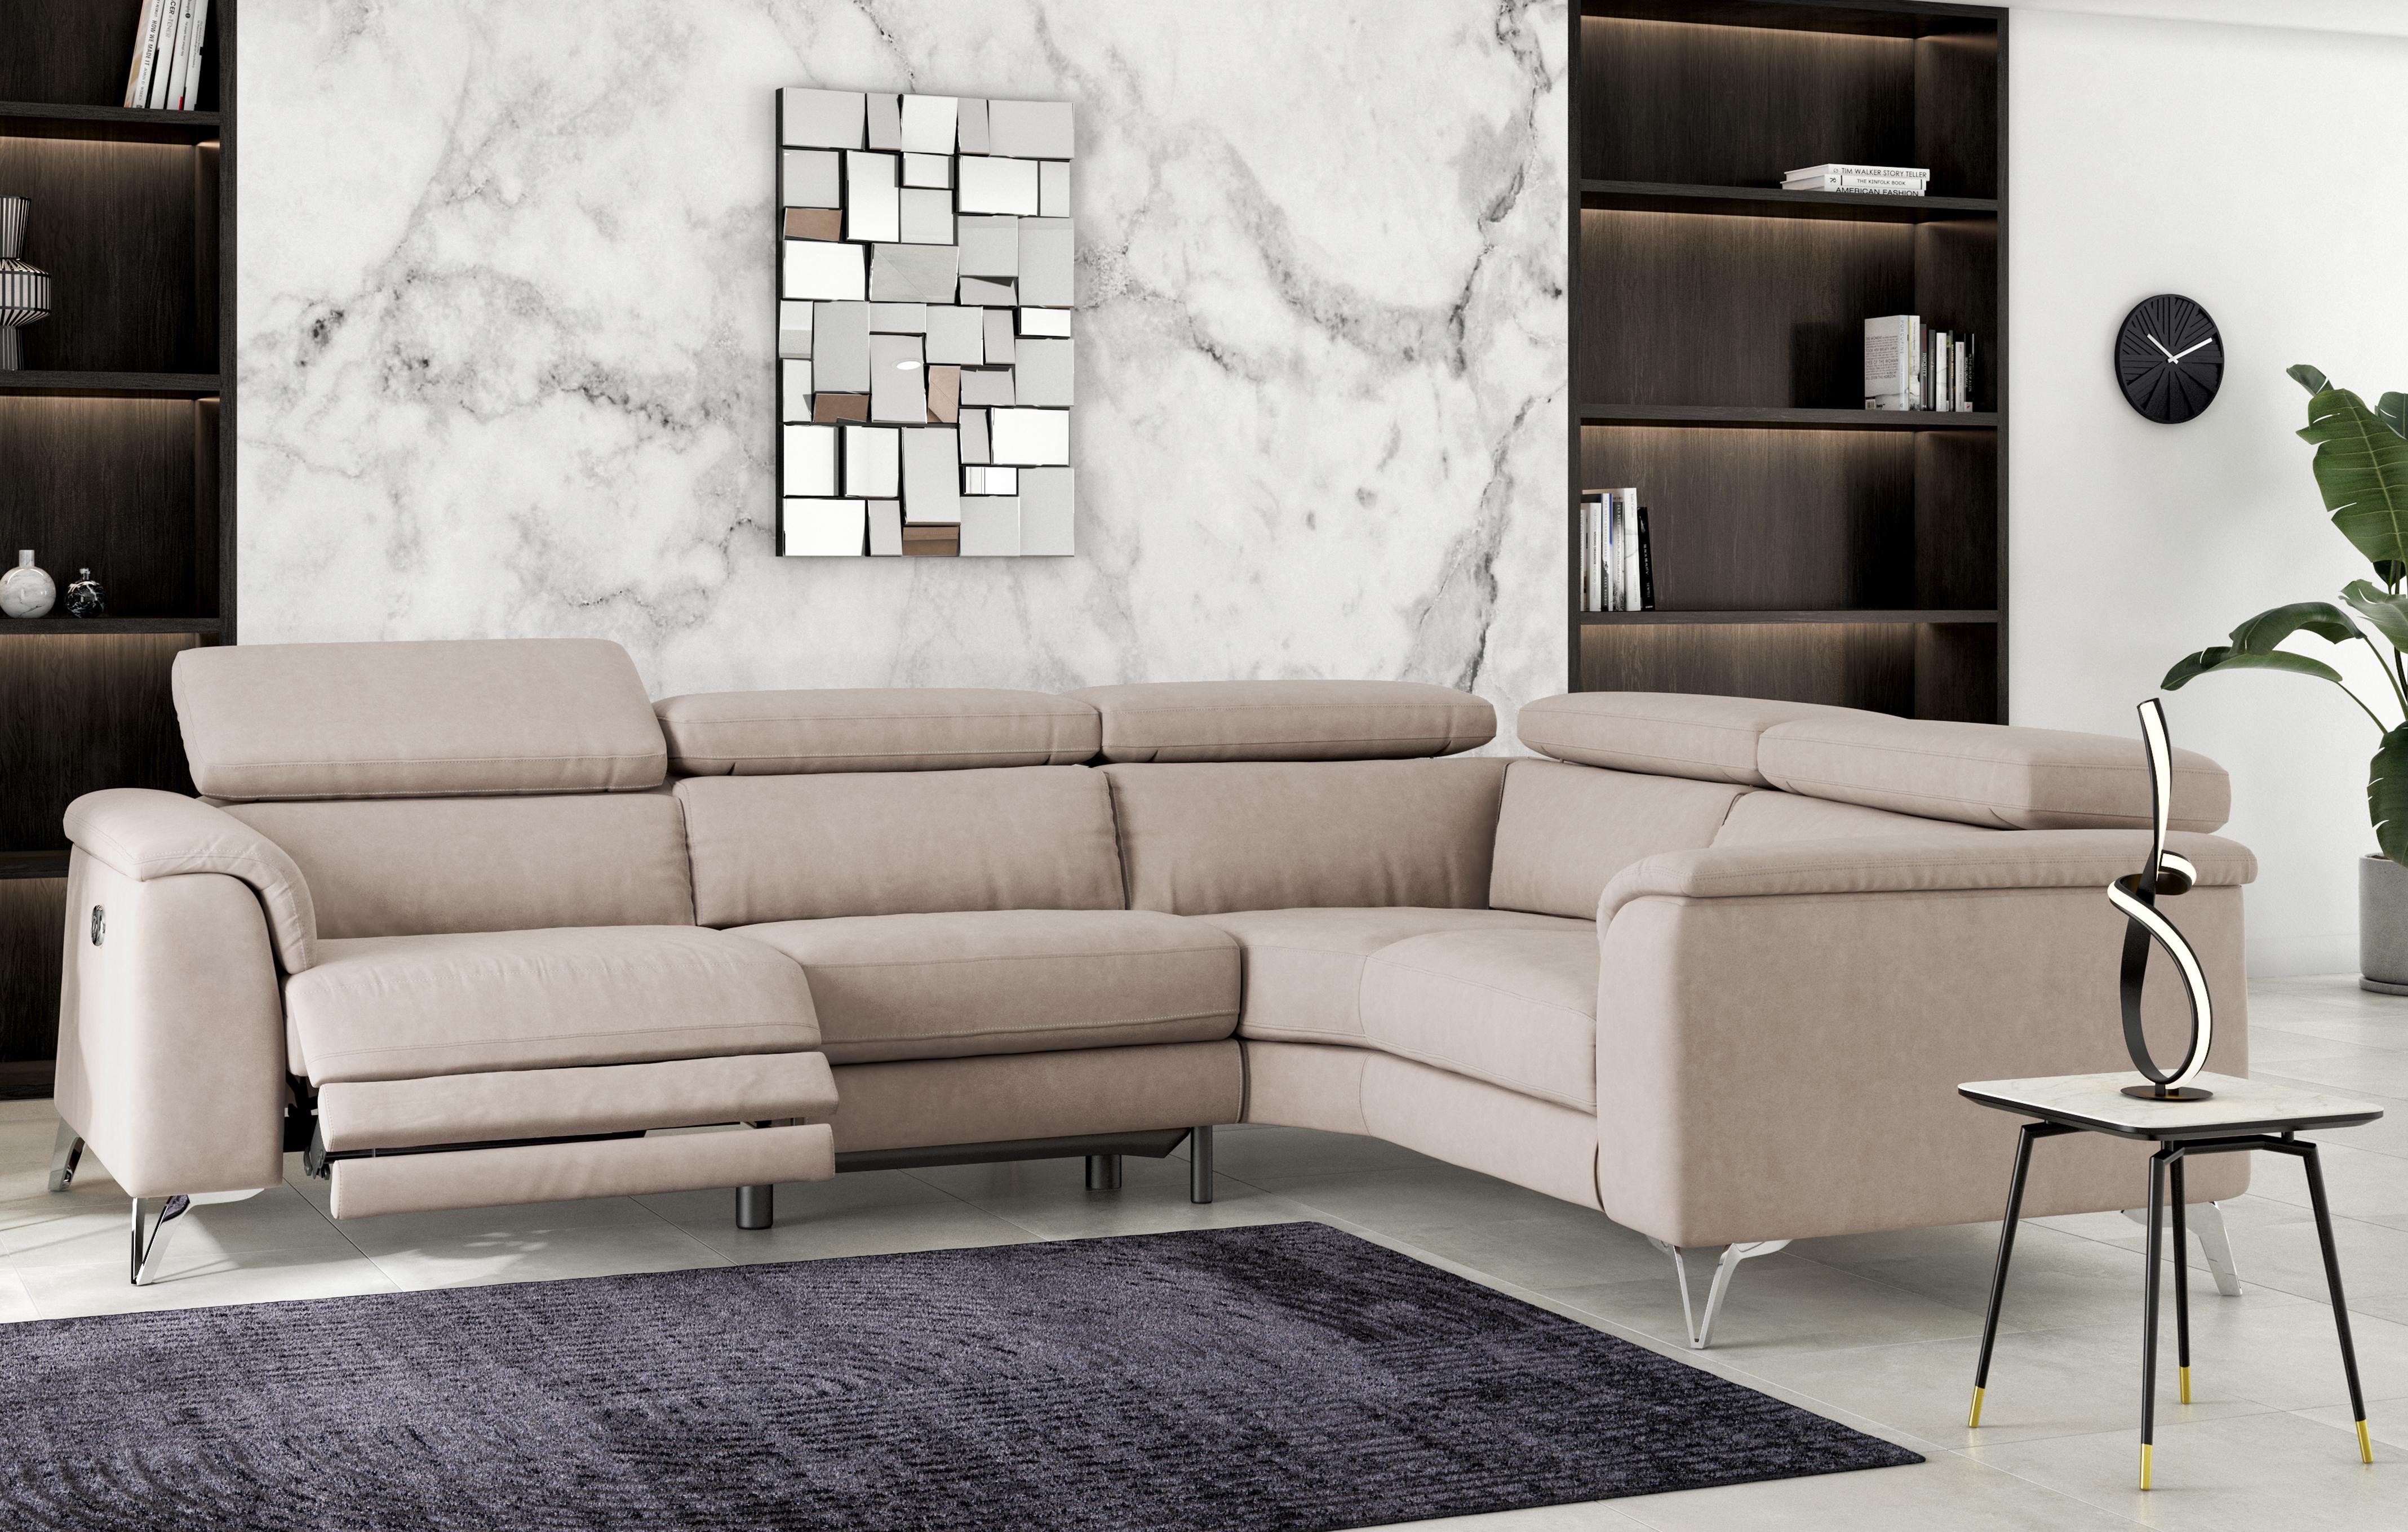 Corner recliner sofas in a range of styles Ireland | DFS Ireland